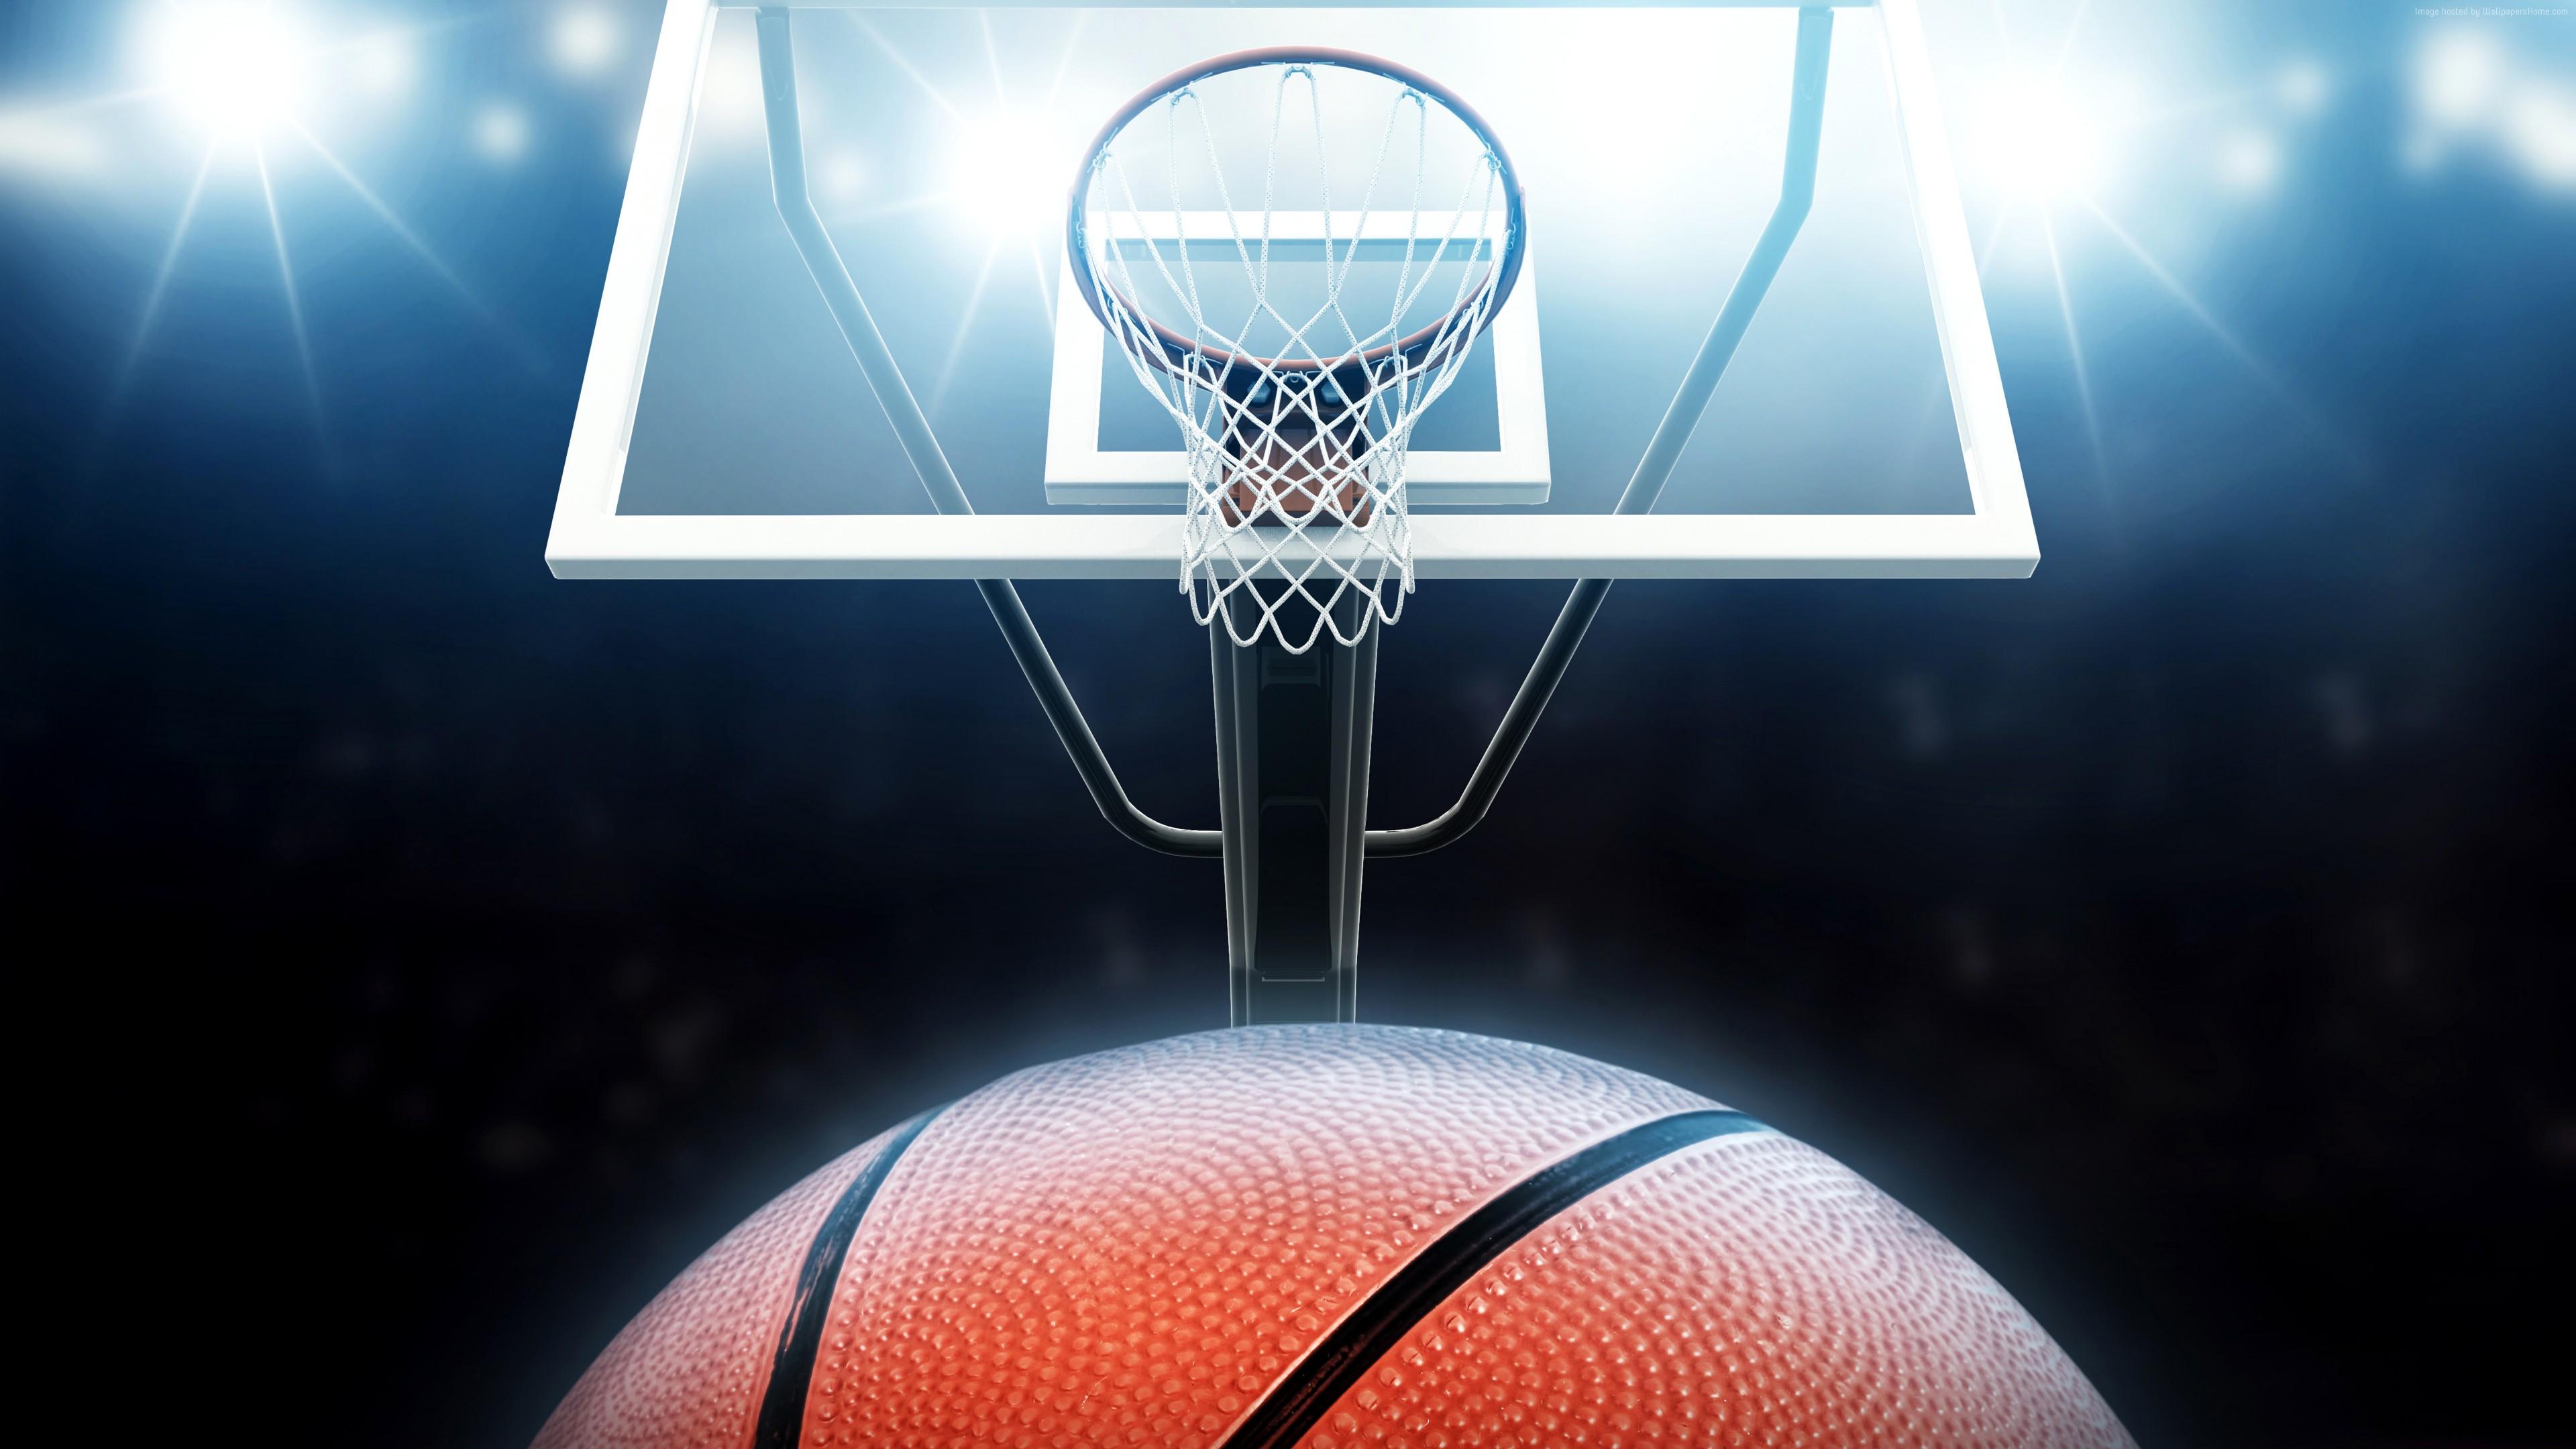 Sport Wallpaper Basketball: Basketball 4k, HD Sports, 4k Wallpapers, Images